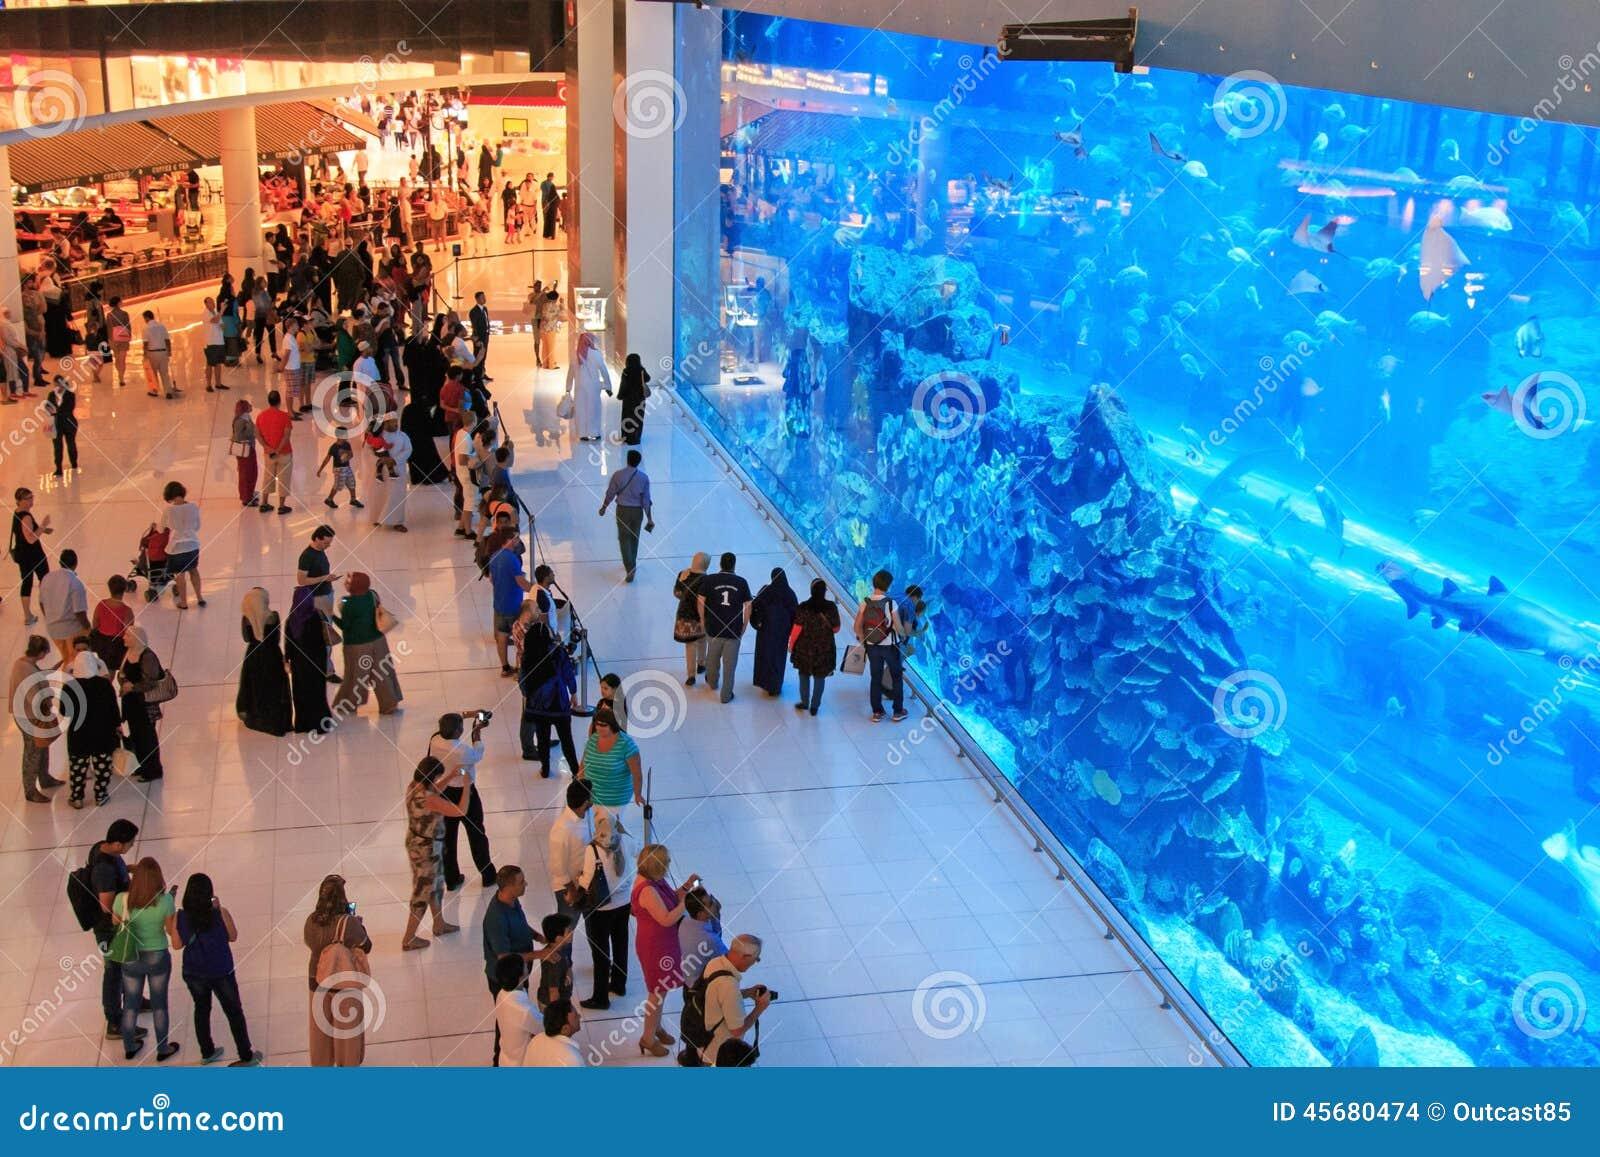 Aquarium in Dubai Mall, world s largest shopping mall